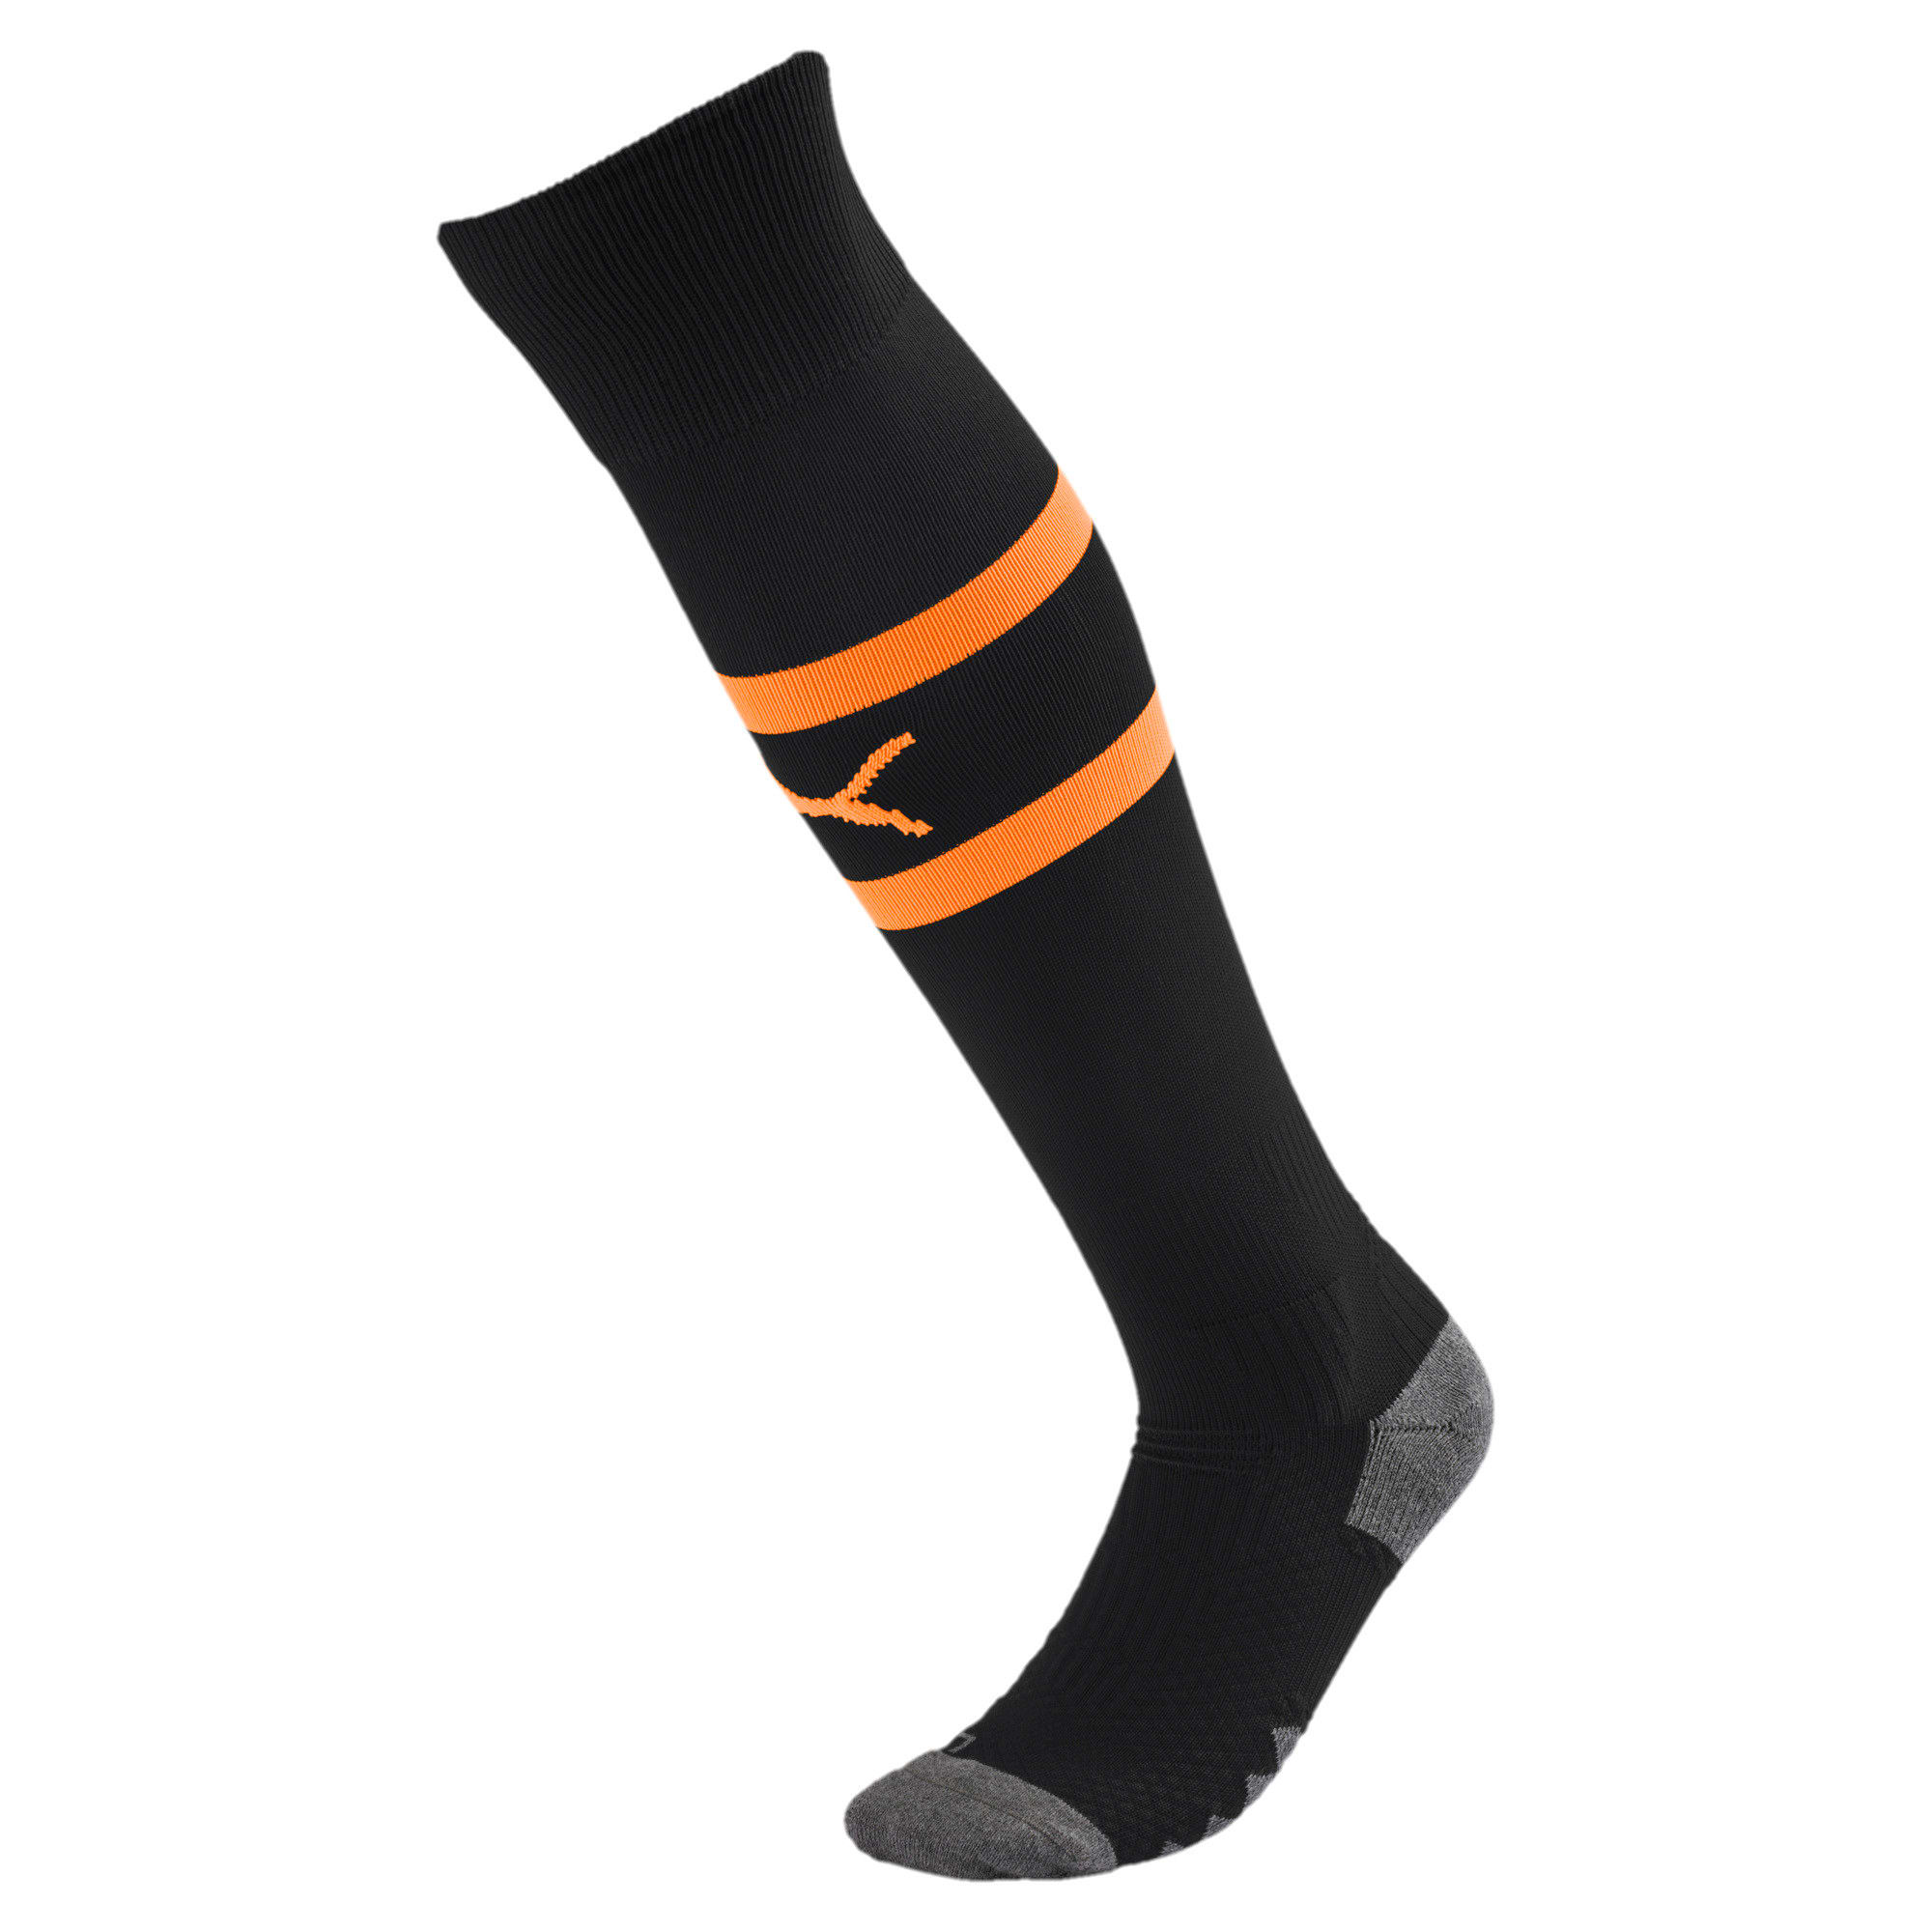 Thumbnail 1 of Valencia CF Men's Banded Socks, Puma Black-Vibrant Orange, medium